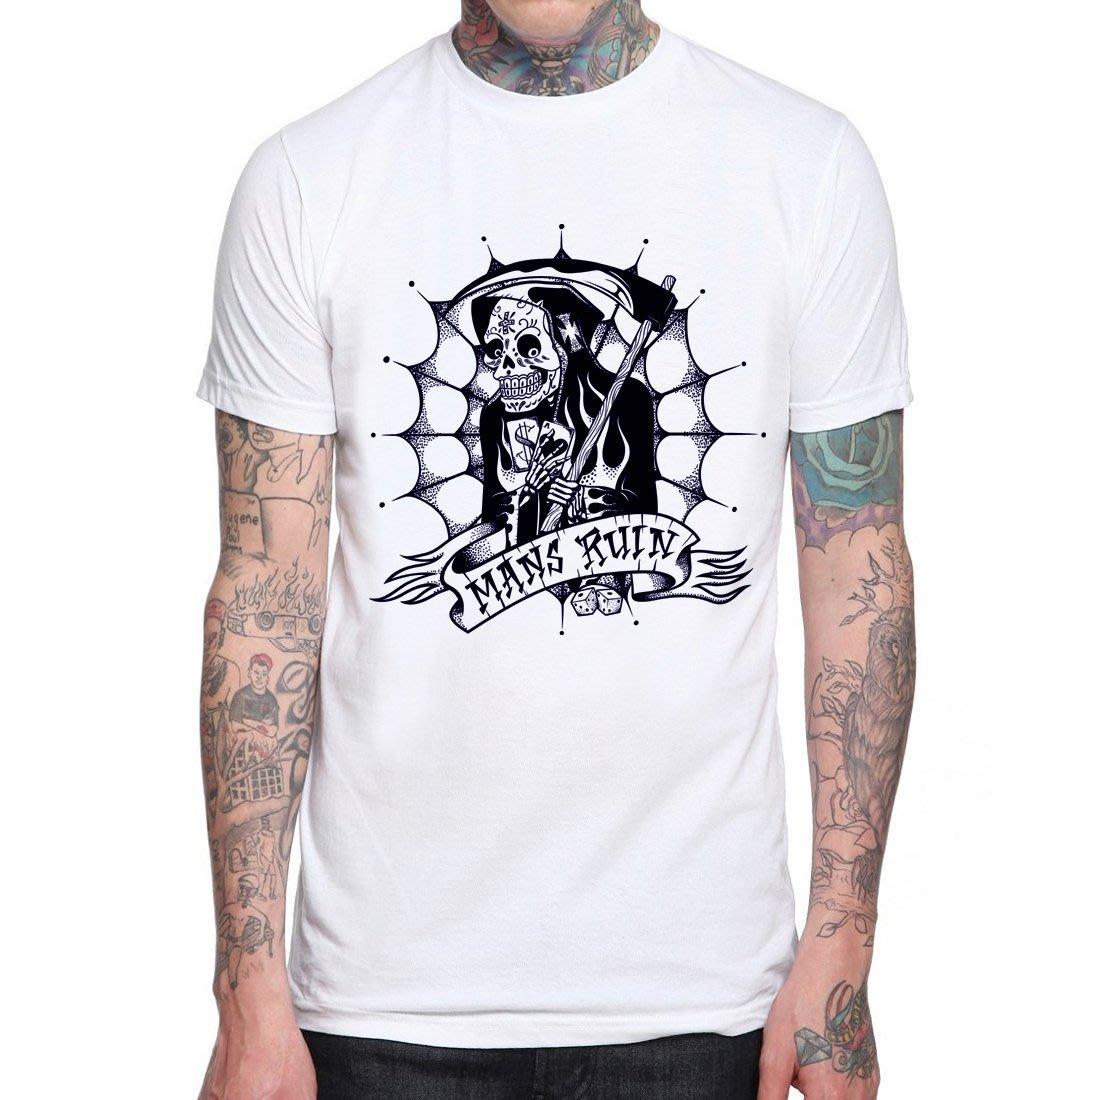 【Dirty Sweet】Mans Ruin短袖T恤-9色 hot rod tattoo刺青硬派搖滾西岸滑板街頭390